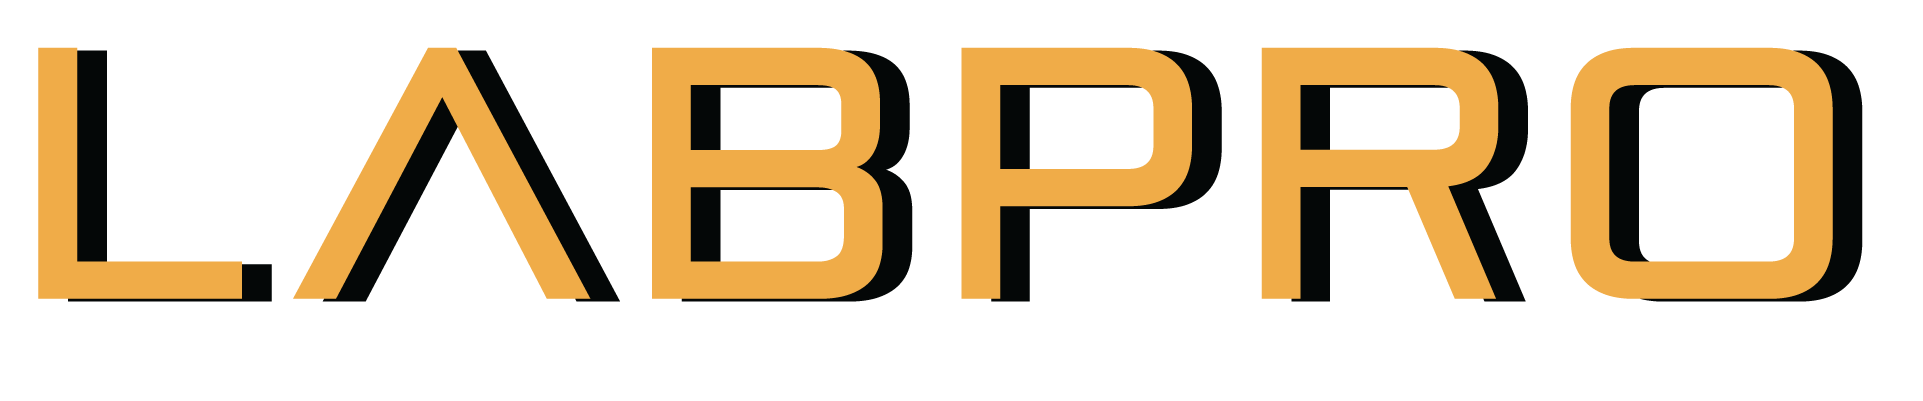 Creative Production House